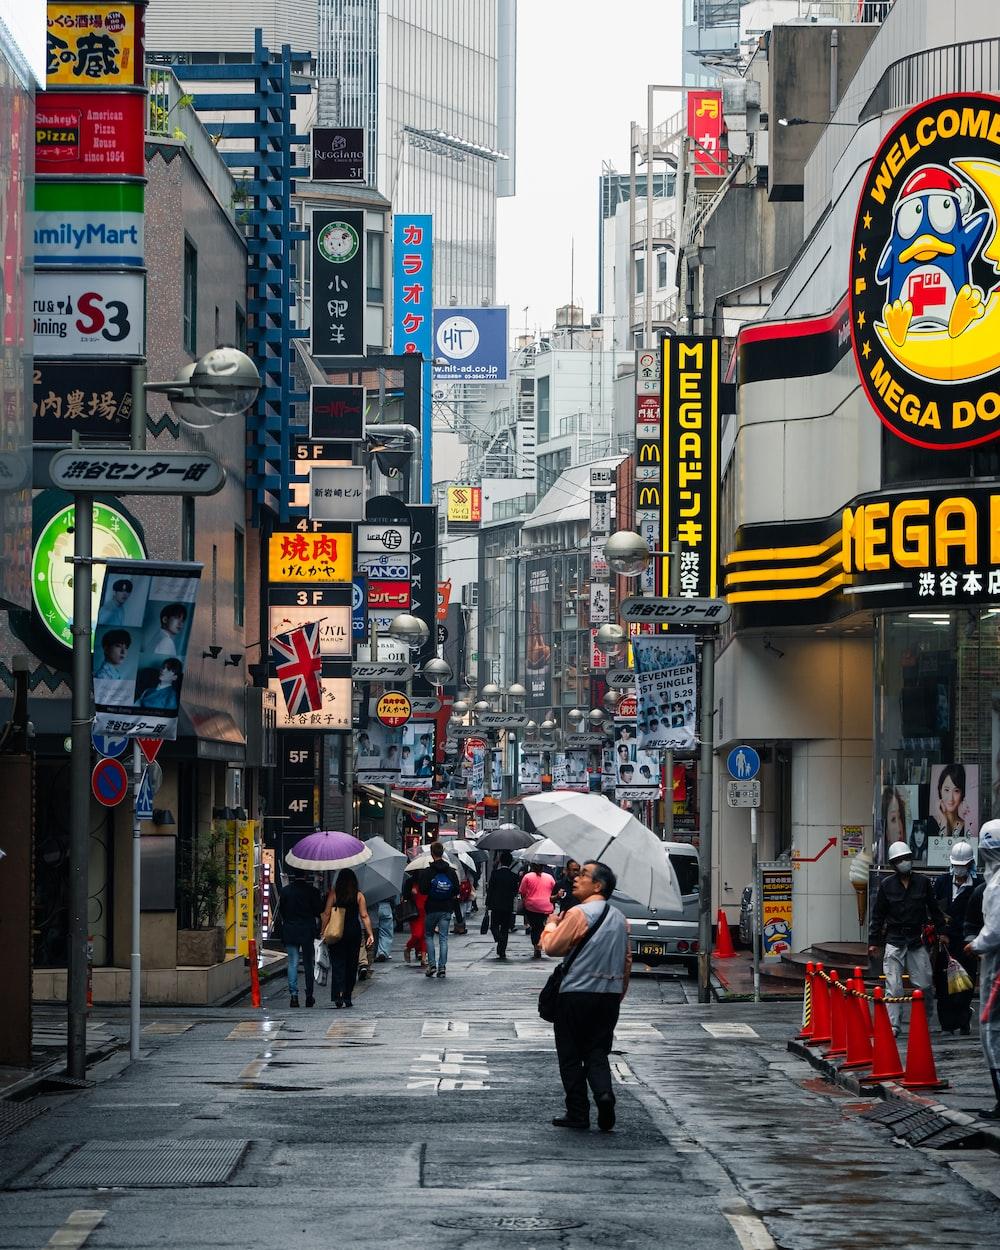 people walking near high-rise buildings during daytime